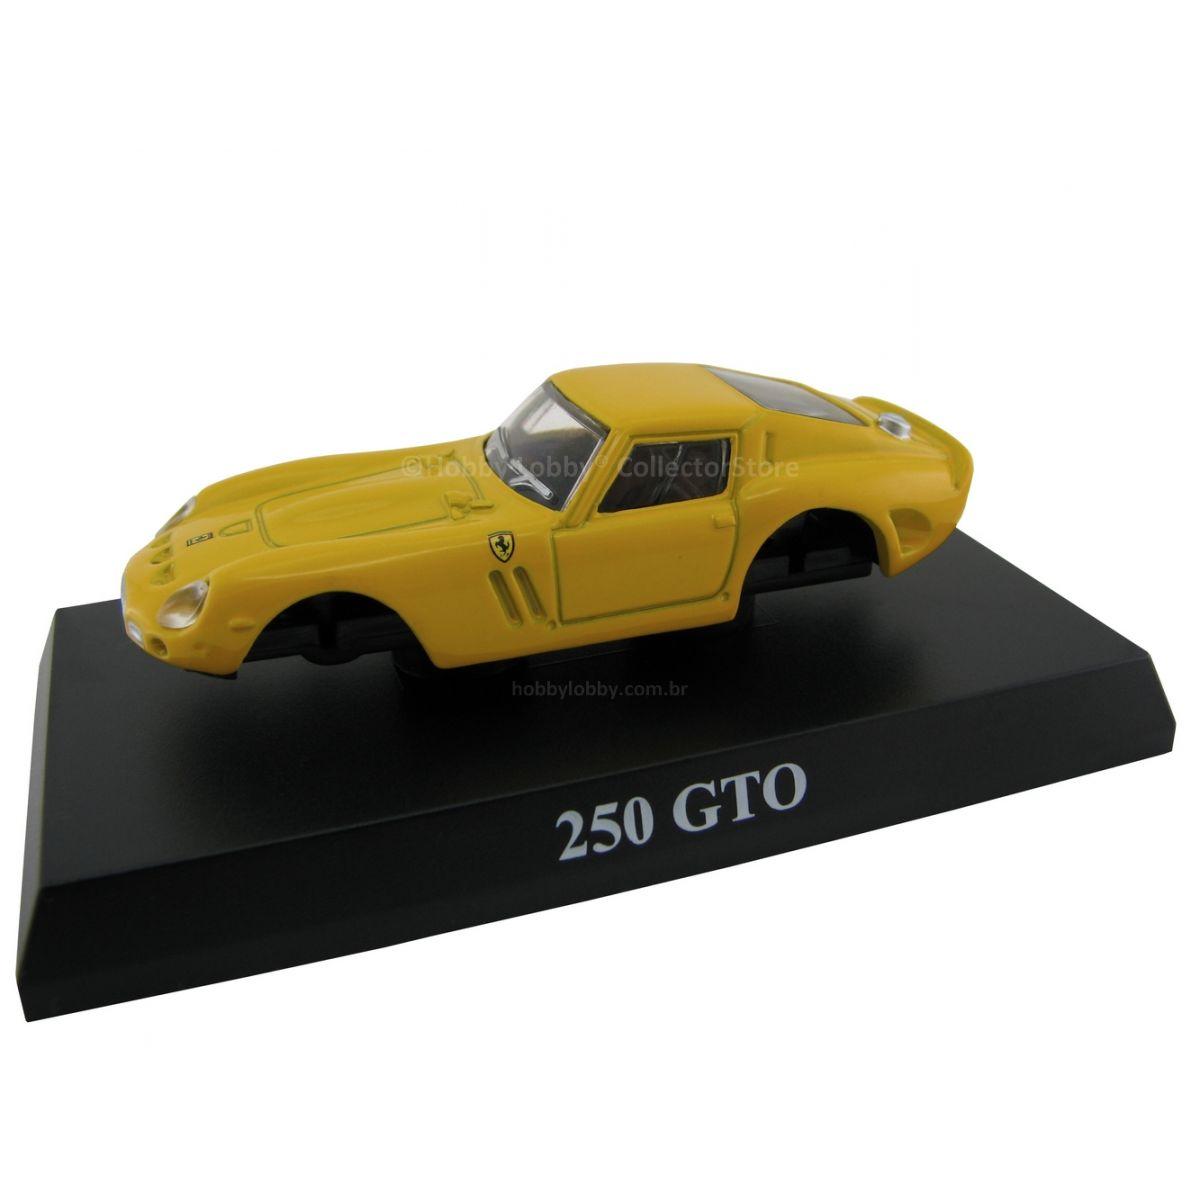 Kyosho - Ferrari Minicar Collection II - Ferrari 250 GTO (amarela)  - Hobby Lobby CollectorStore